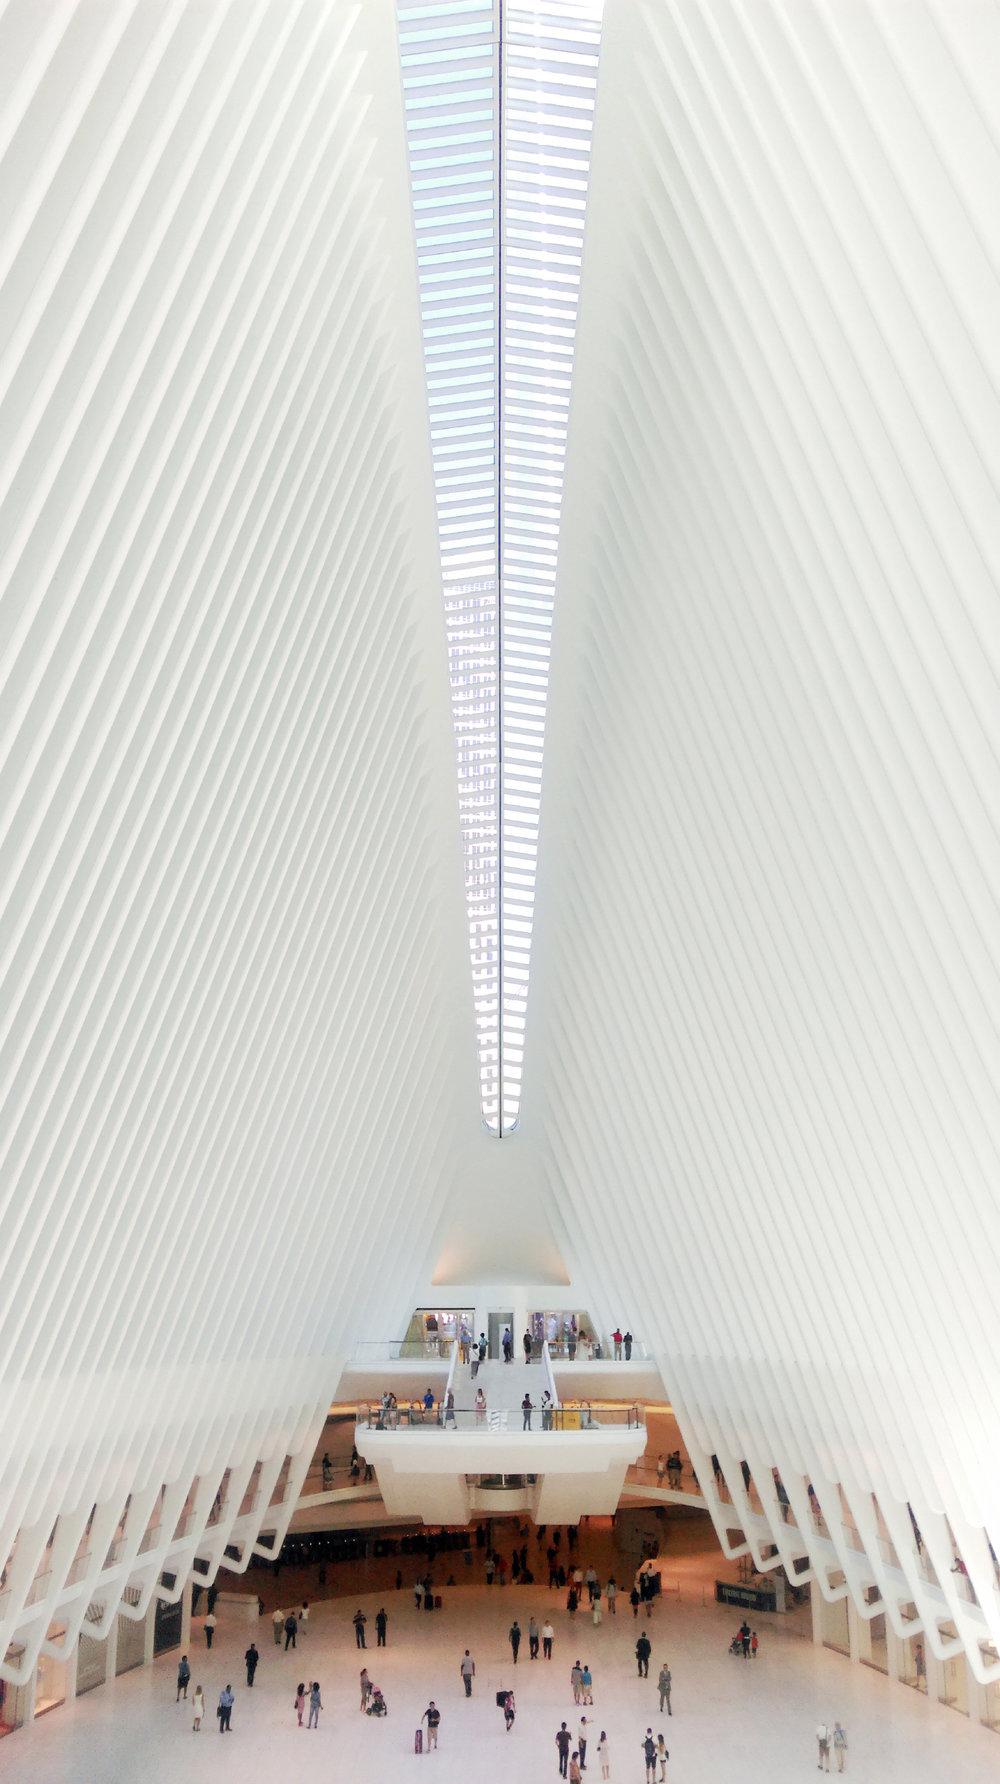 World Trade Center Memorial Oculus